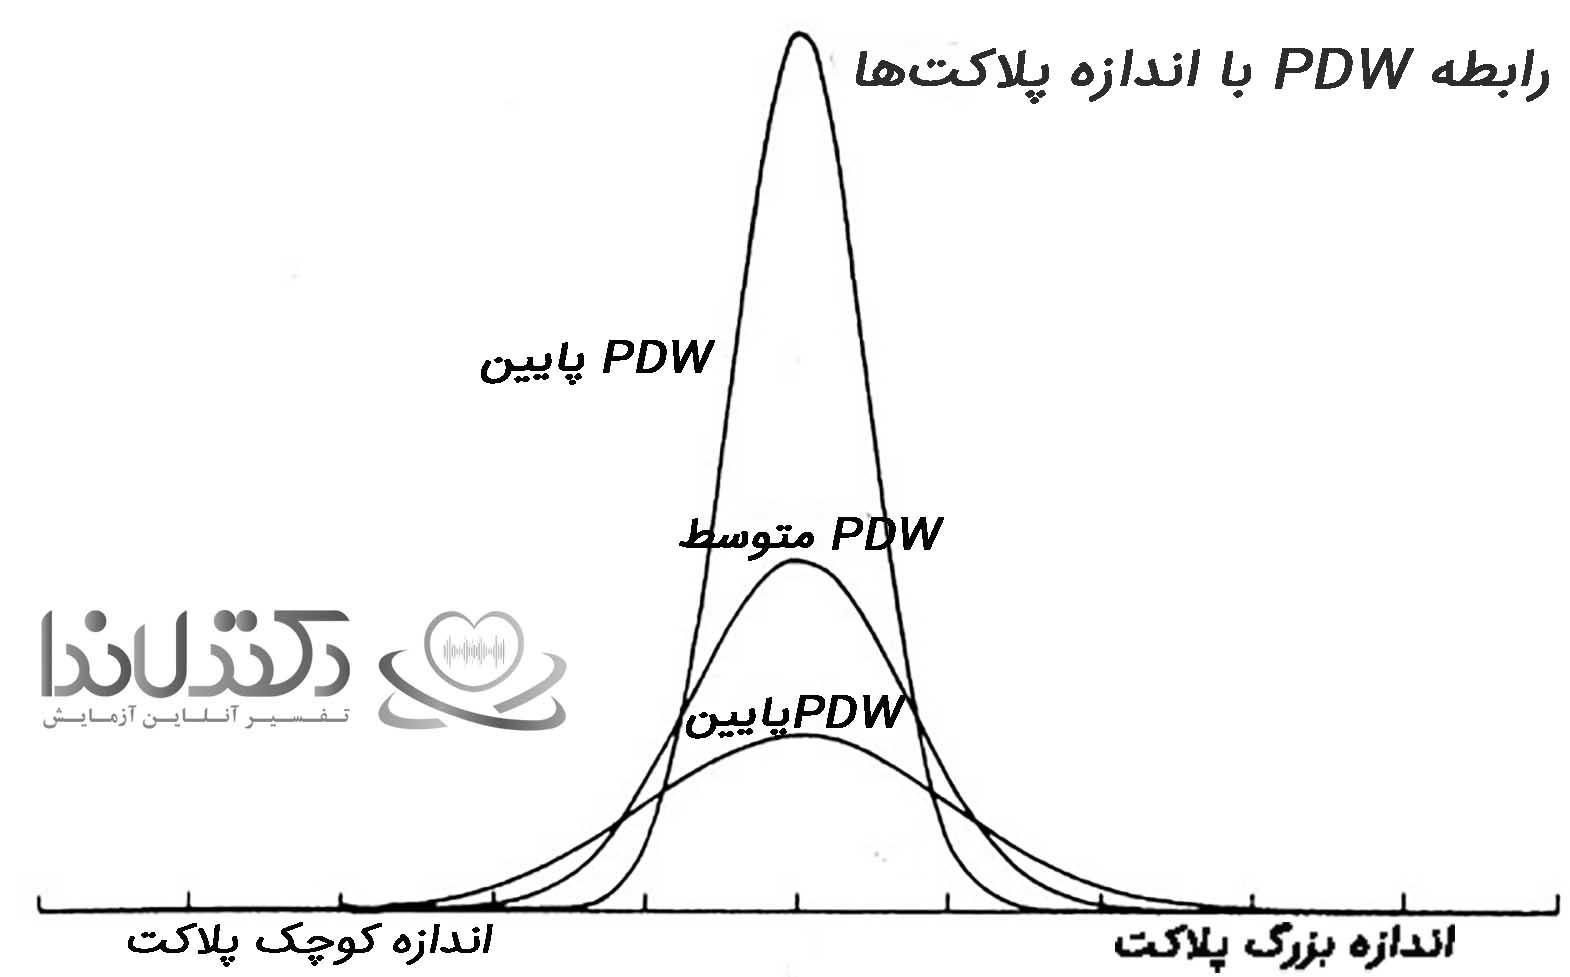 pdw-آزمایش